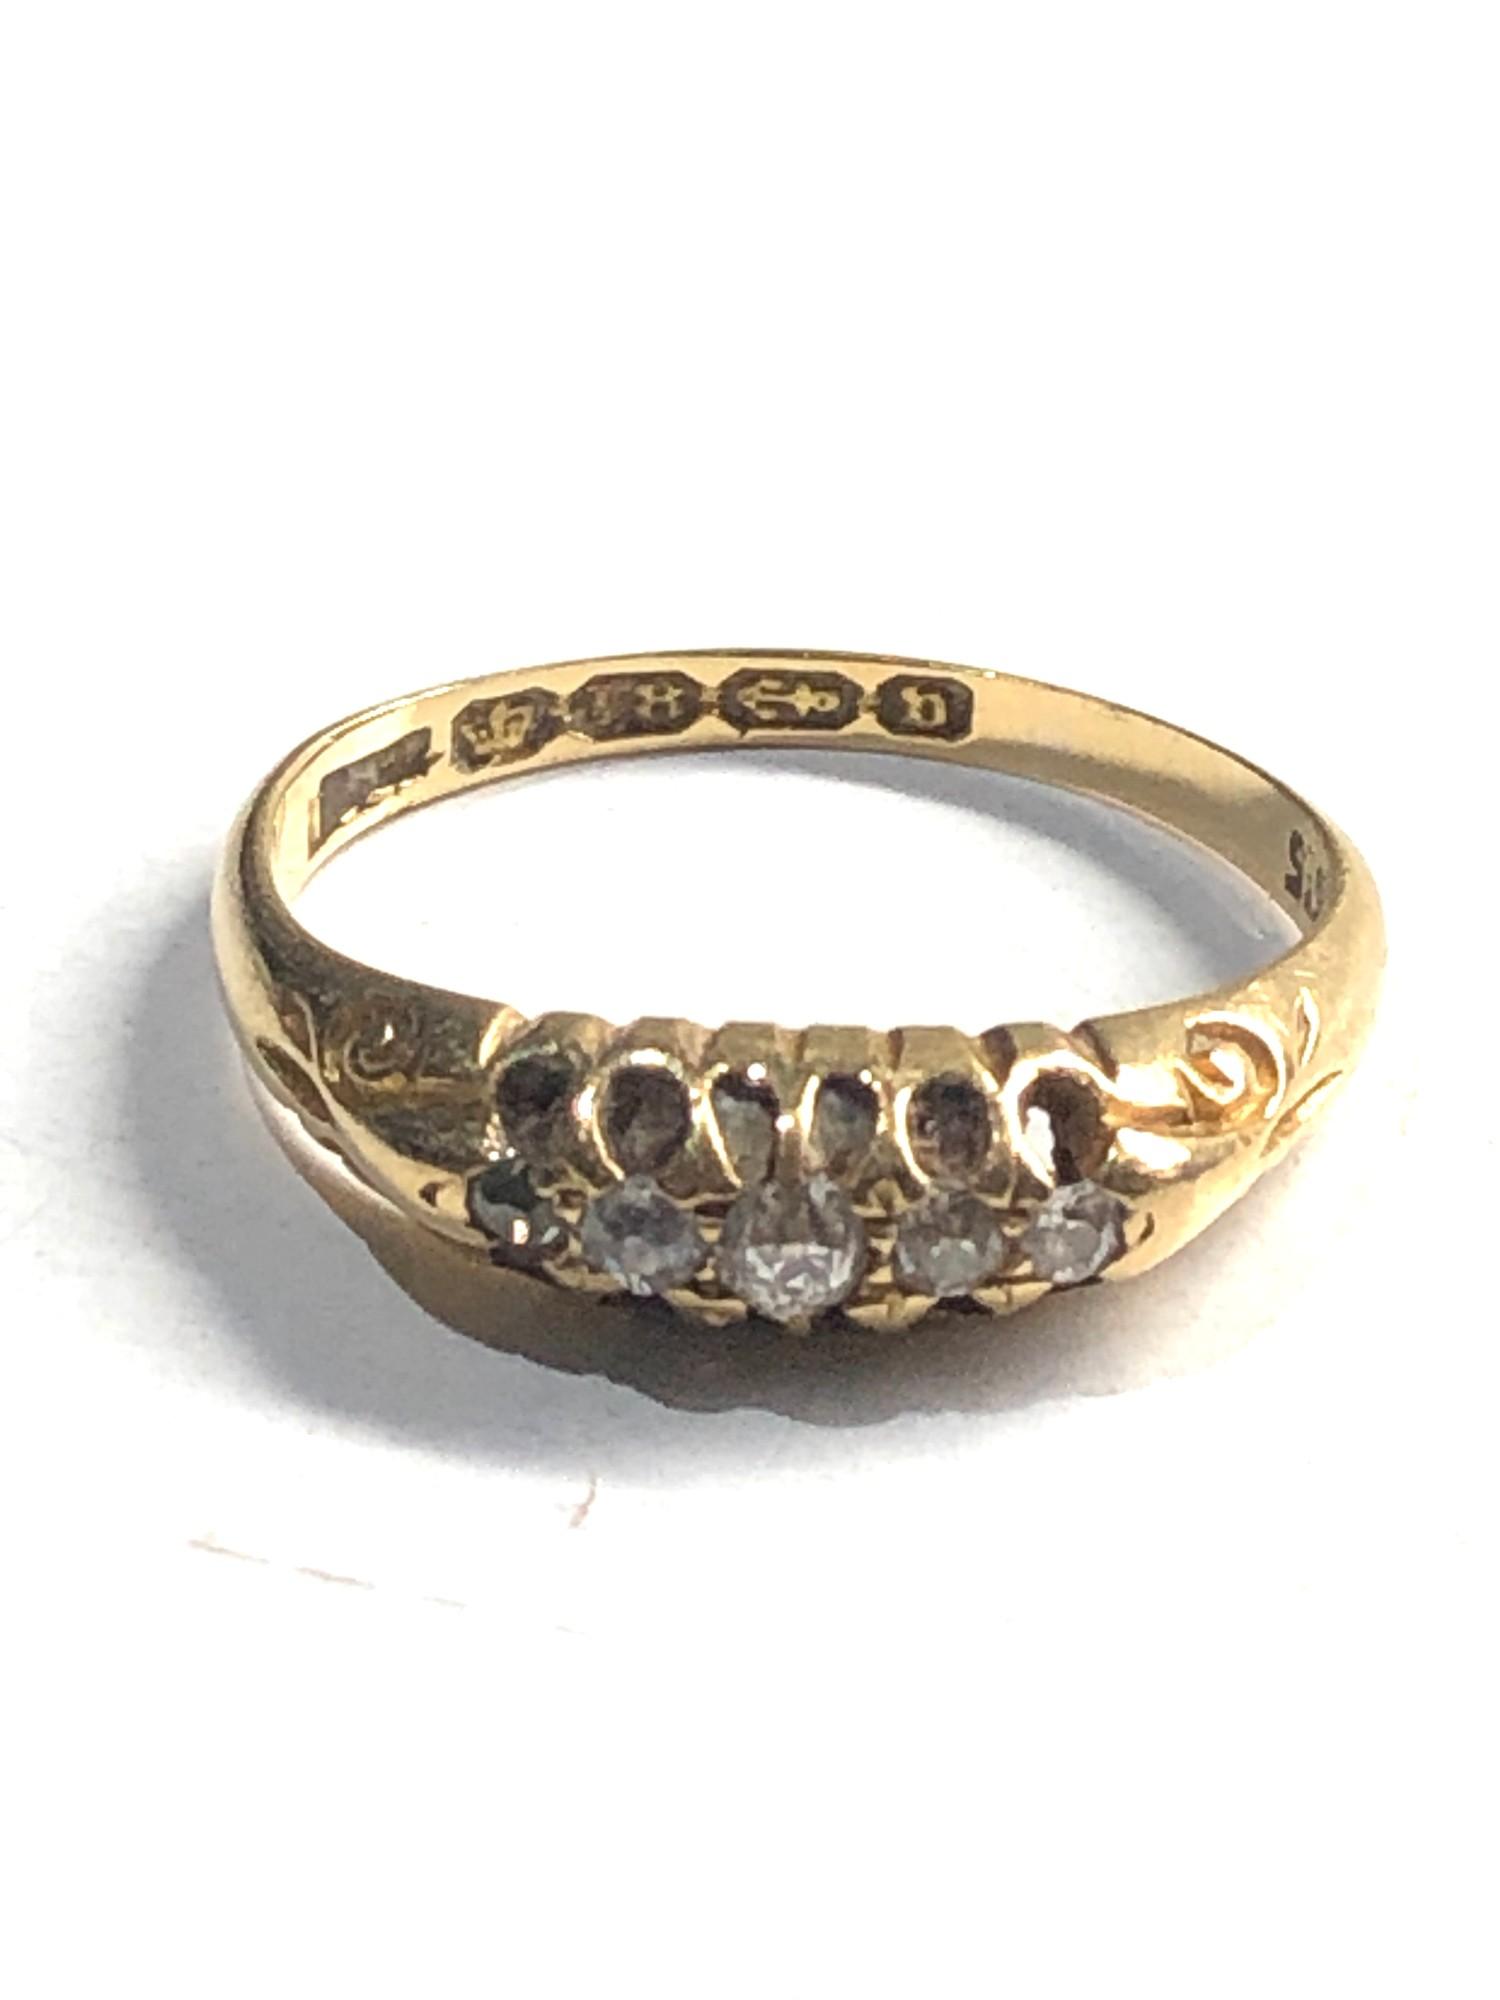 18ct vintage diamond five stone ring 2.4g